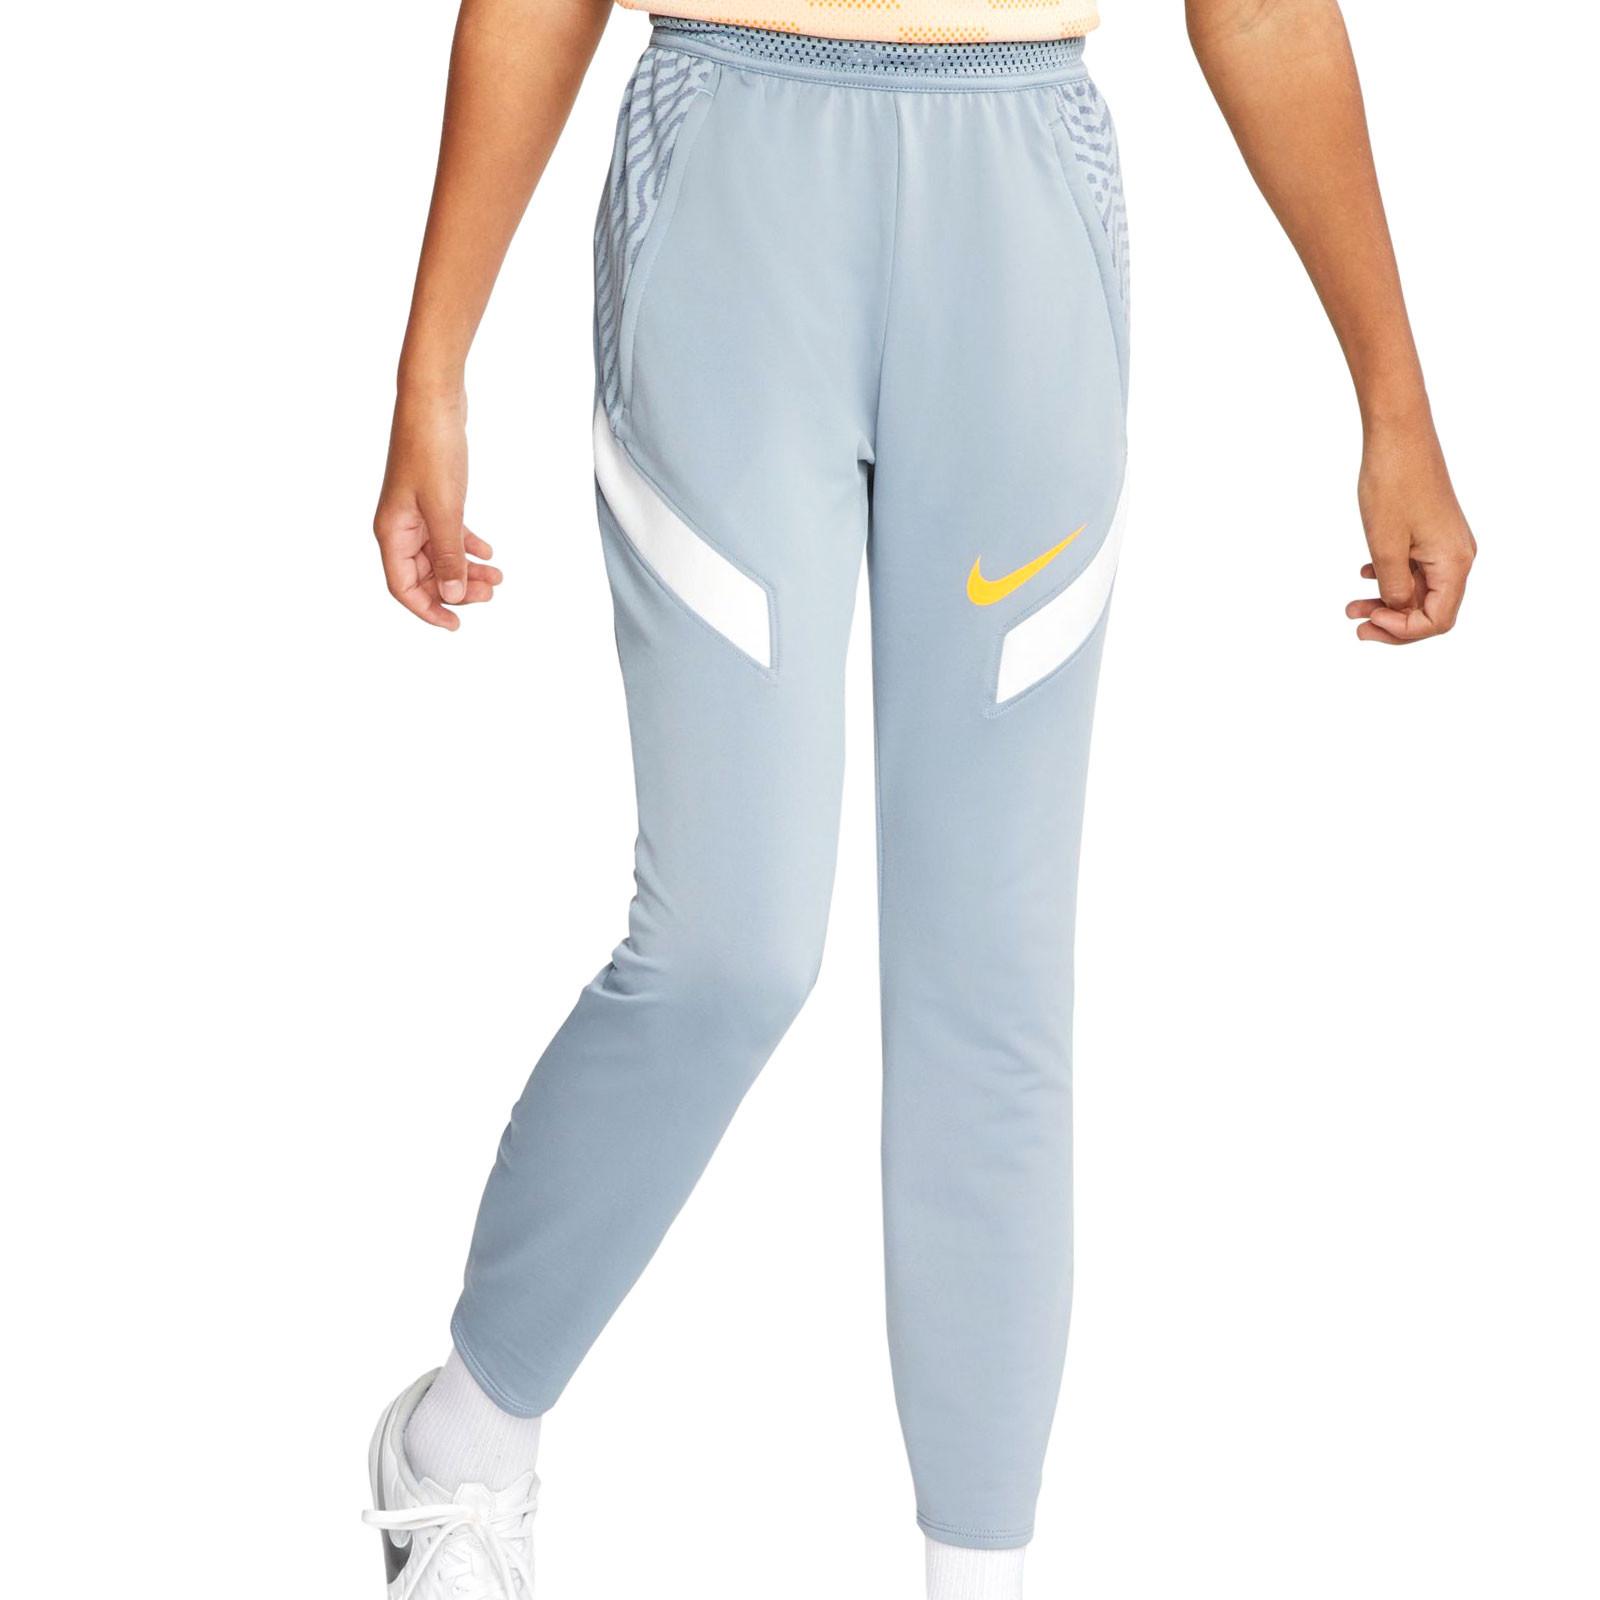 تعداد السكان صدفة تغضب Pantalones Entrenamiento Futbol Ajustados Nike Mujer Pleasantgroveumc Net